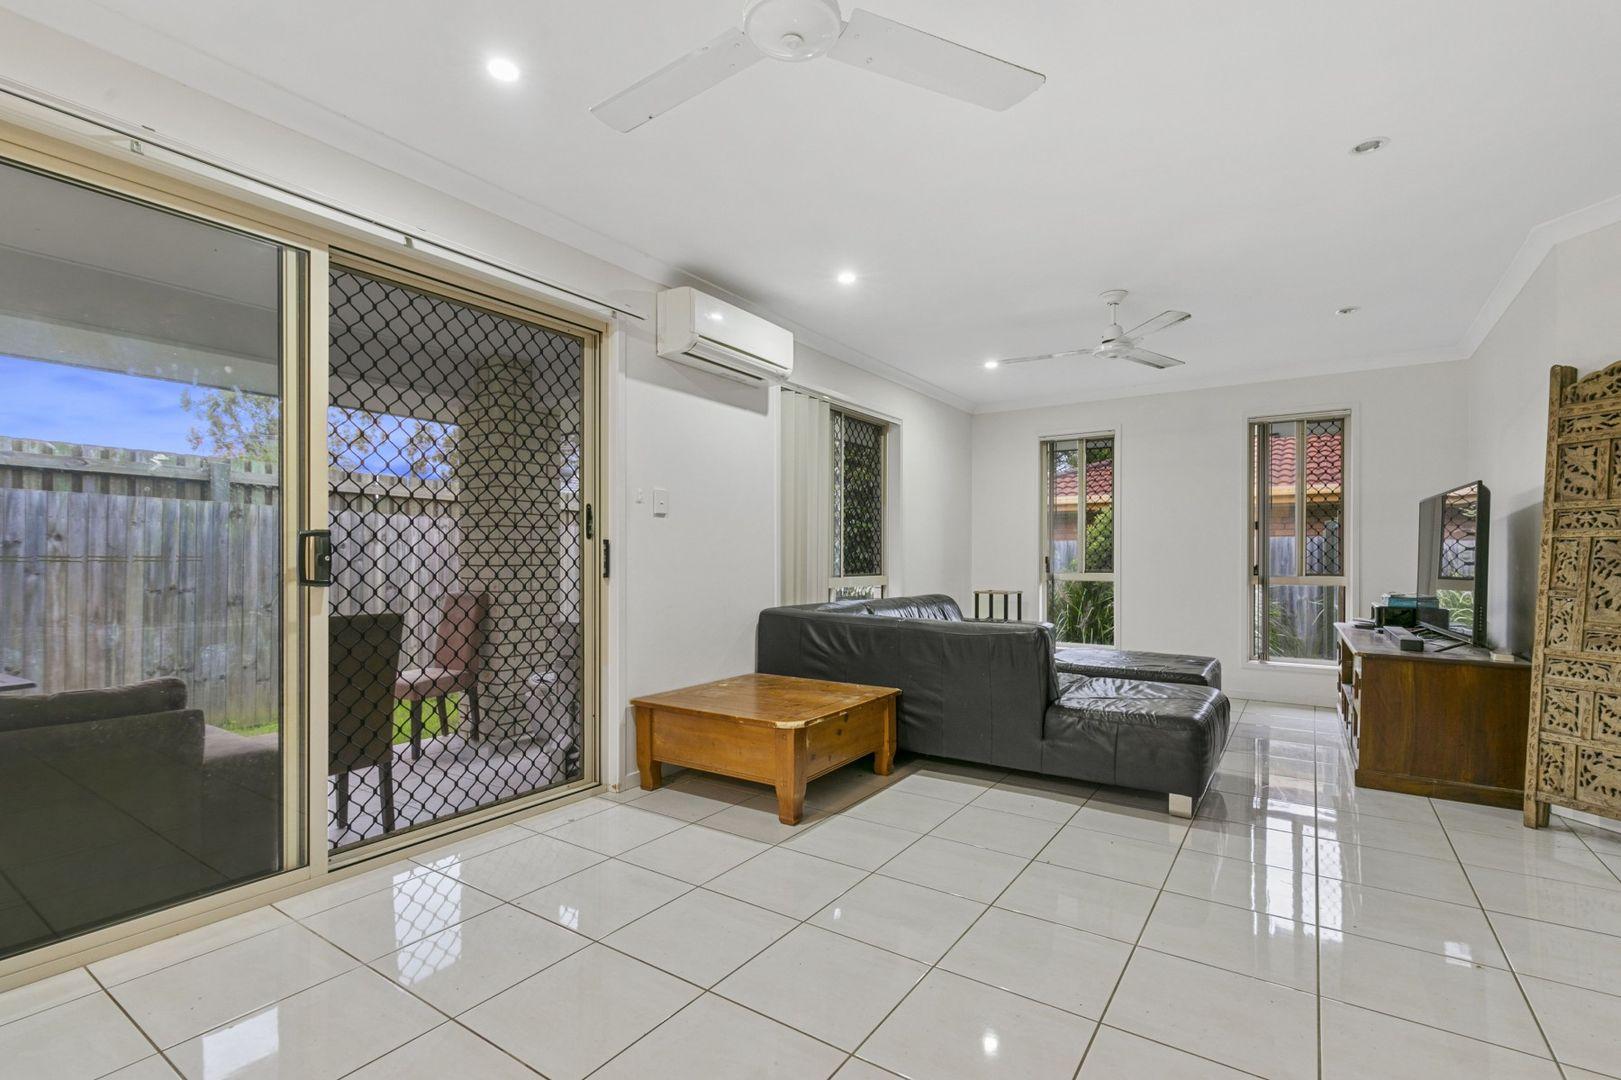 1/22 Nottinghill Street, Birkdale QLD 4159, Image 2